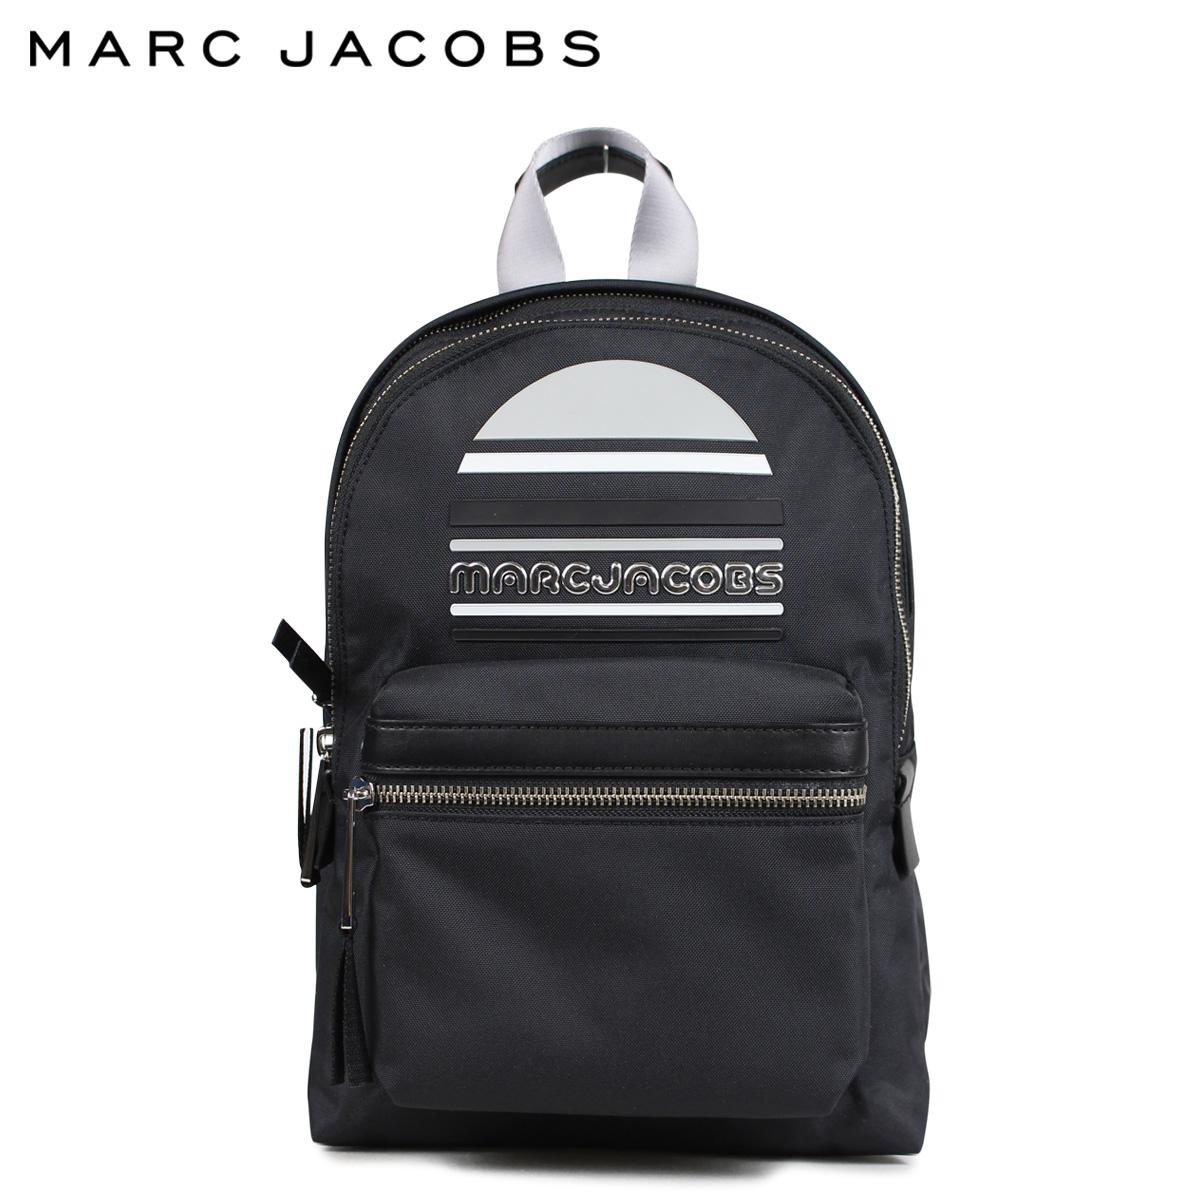 MARC JACOBS MEDIUM BACKPACK マークジェイコブス リュック バッグ バックパック レディース メンズ ブラック 黒 M0014035